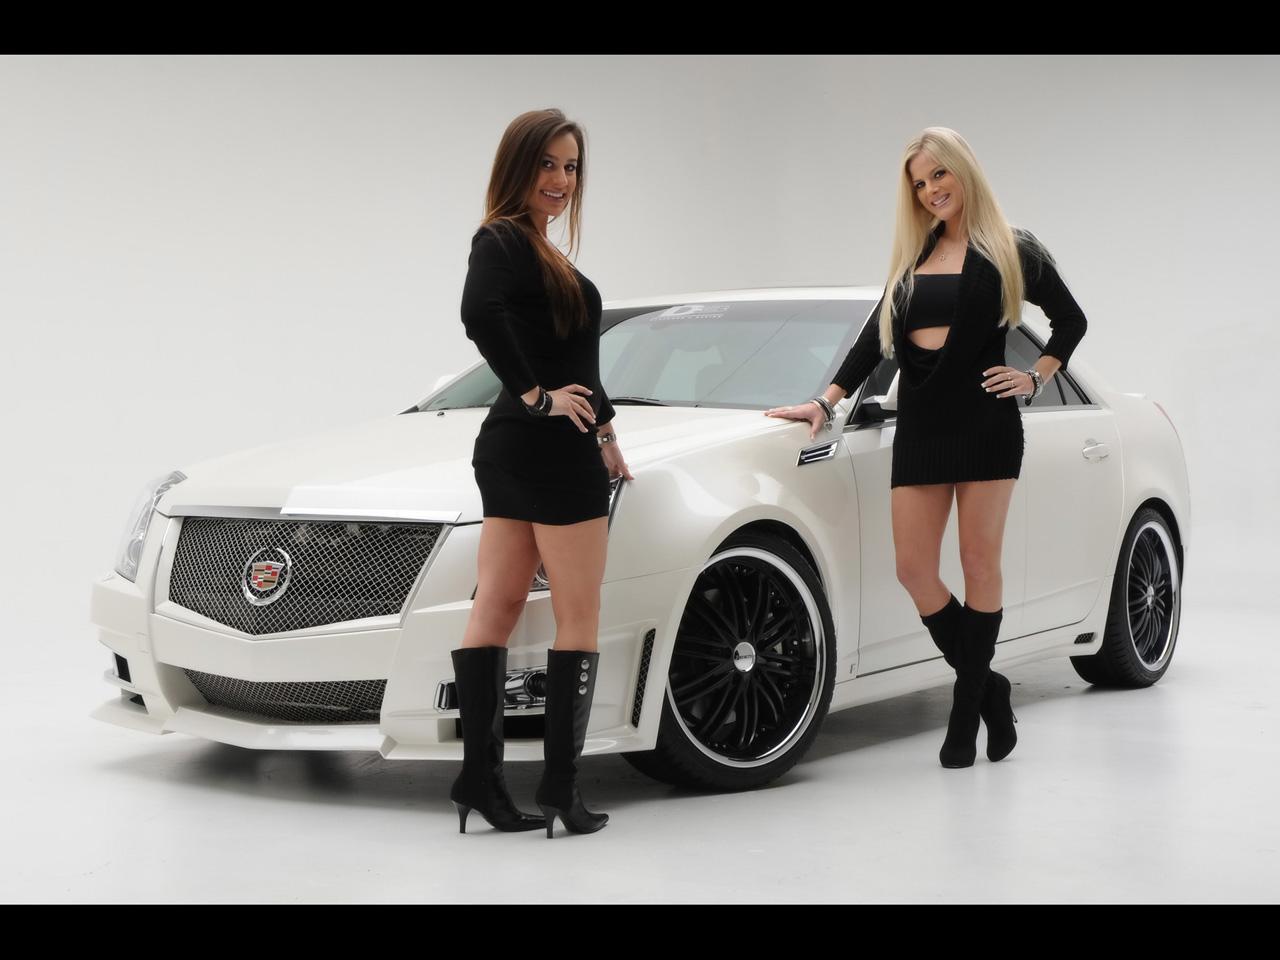 D3 Cadillac Cts Merci Les Girls